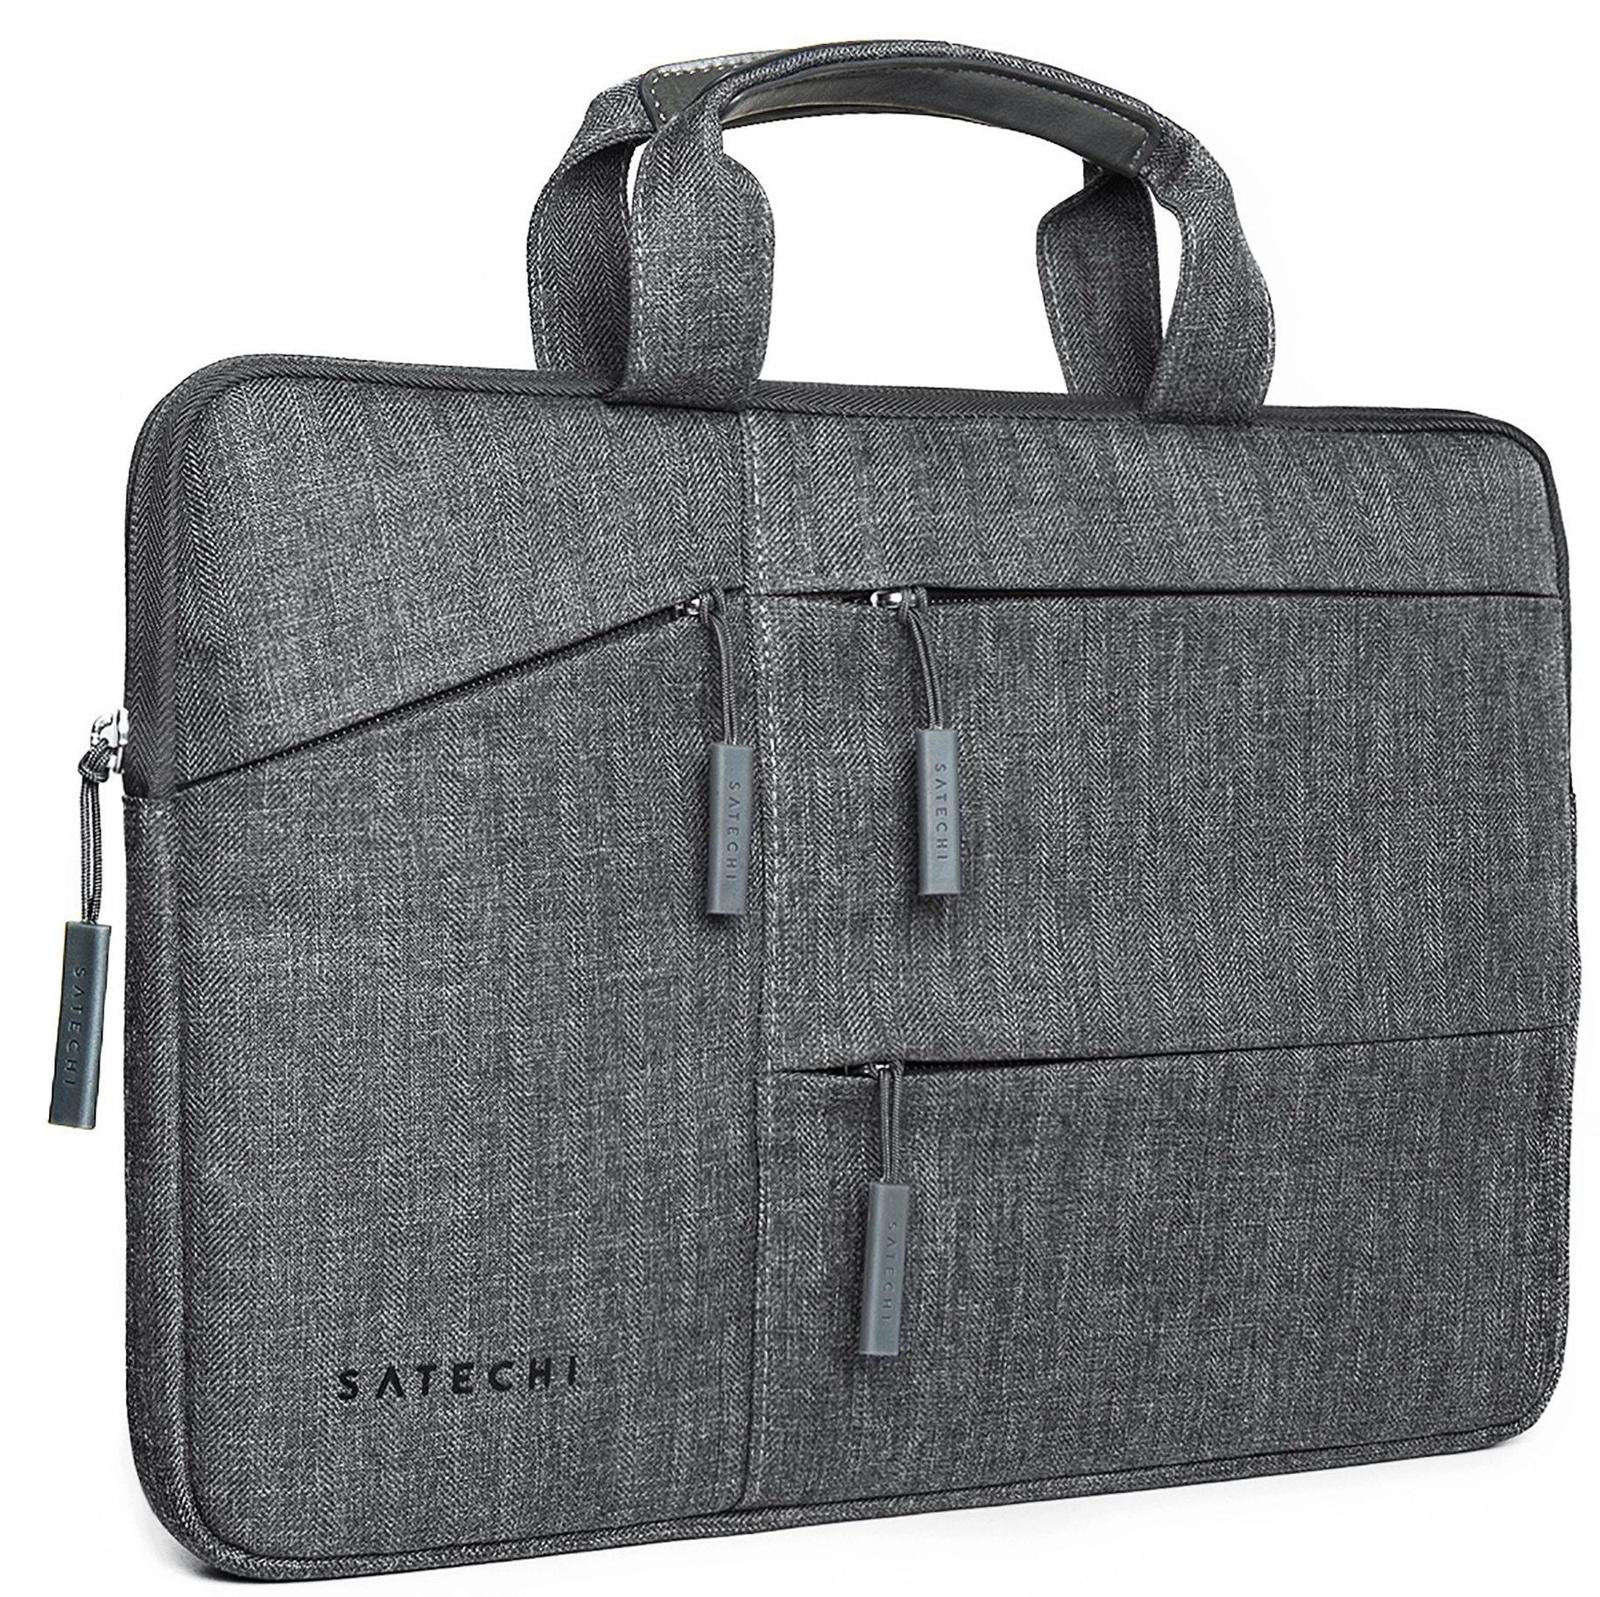 Сумка Satechi Water-Resistant Laptop Carrying Case для ноутбуков до 15 дюймов. Материал нейлон. Цве